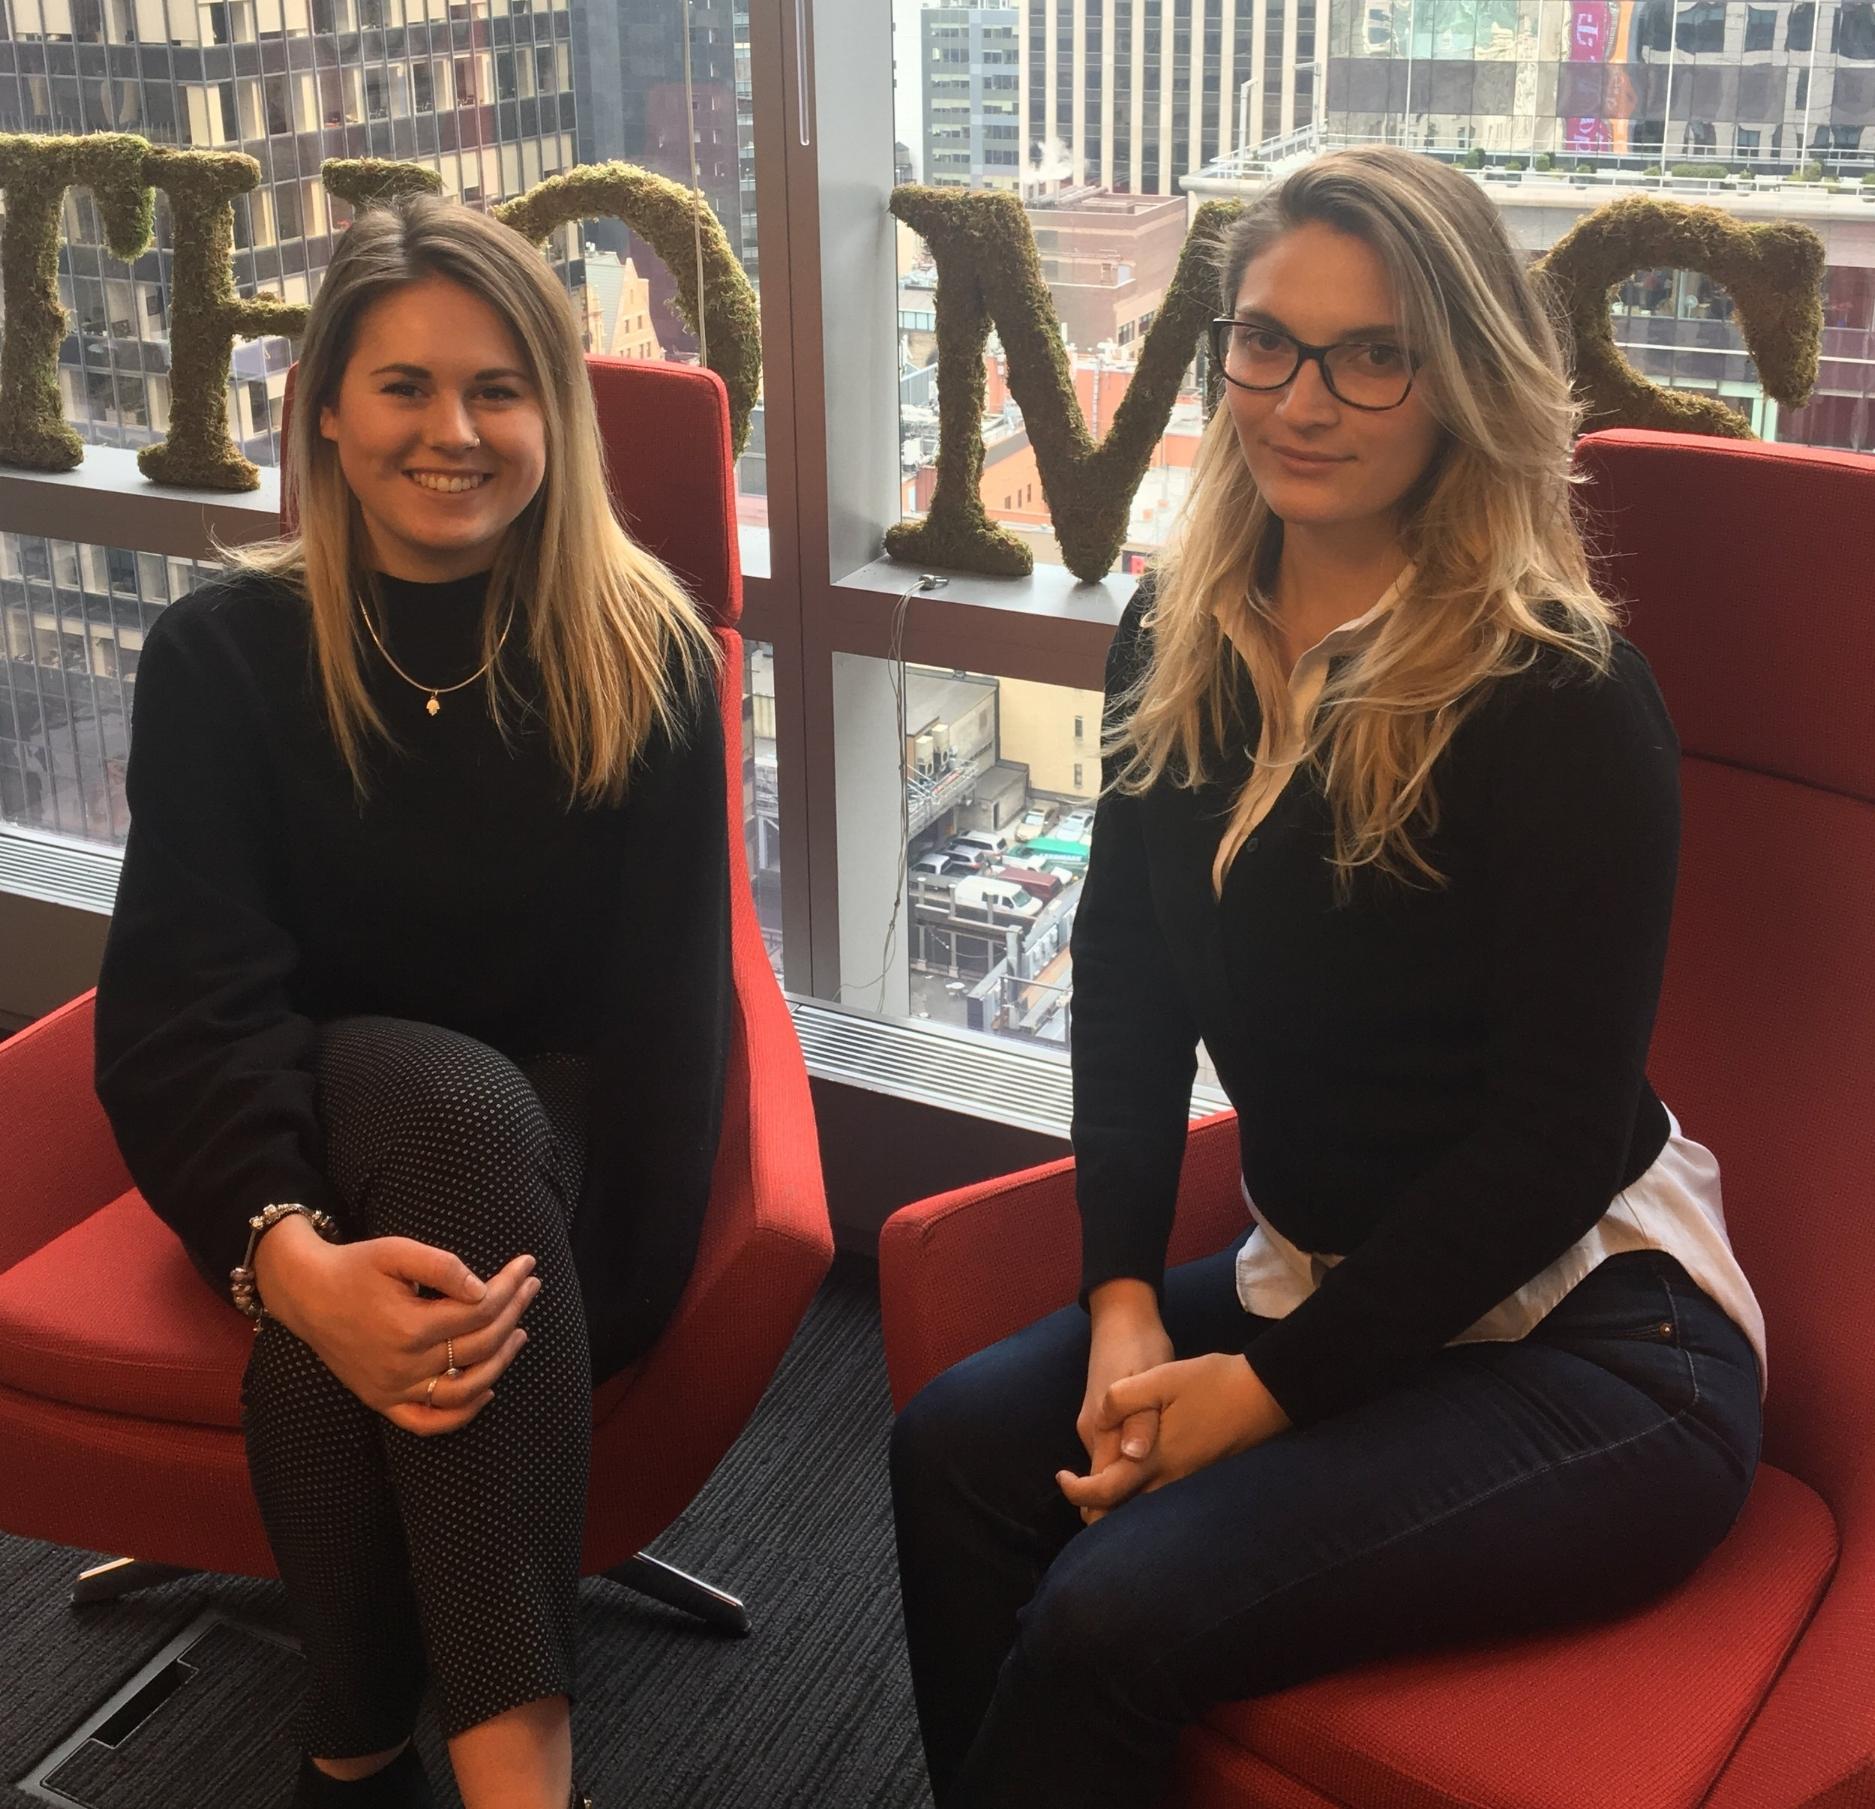 Emily Harper joins fellow GME trainee Nevenka Krzelj as a member of the Regional Marketing Team at Thomson Reuters